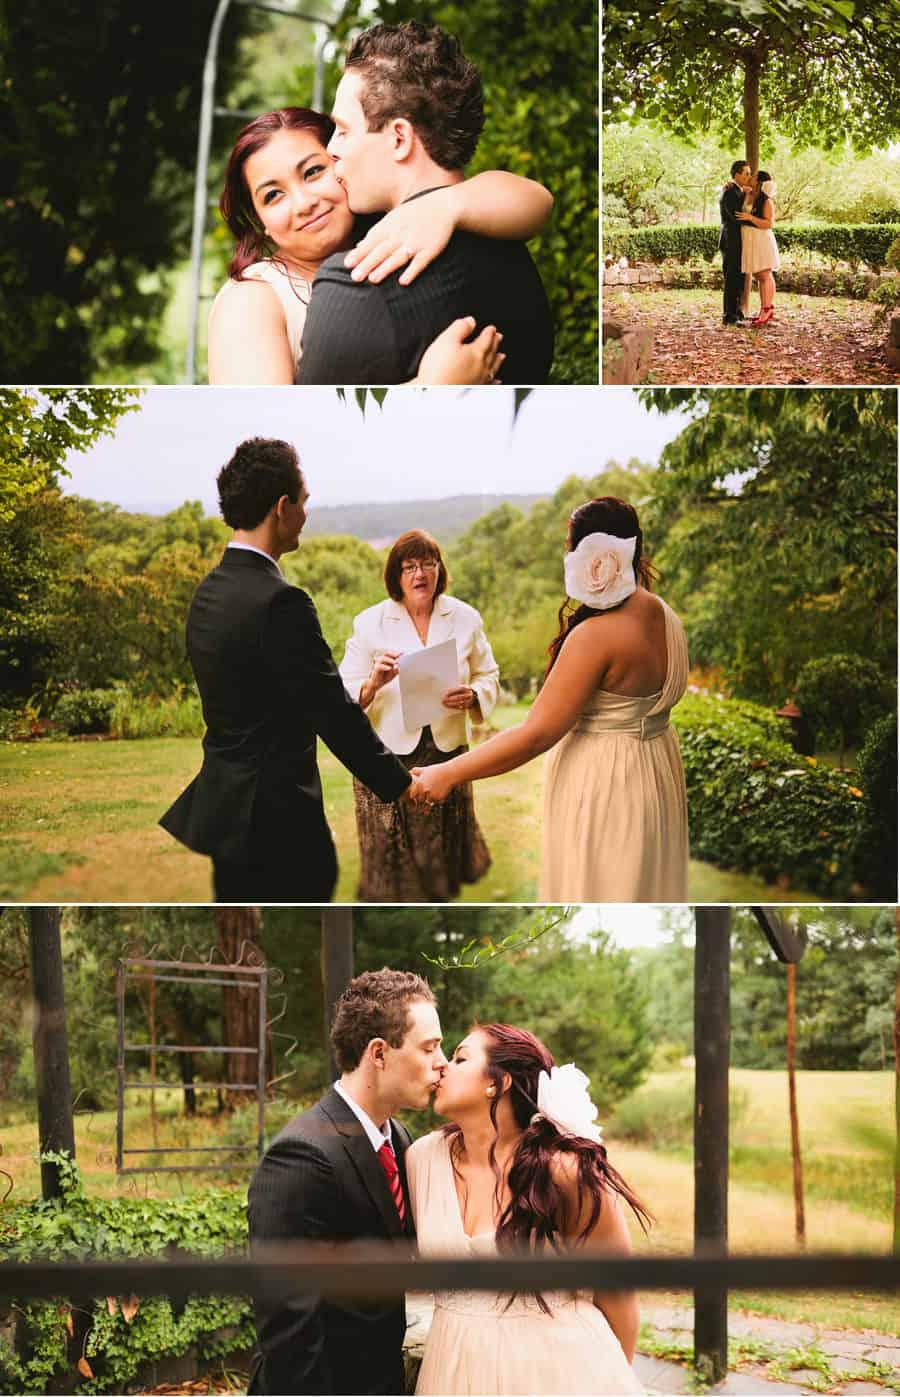 Dandenong Wedding Photography - Tim & Chella Garden Wedding